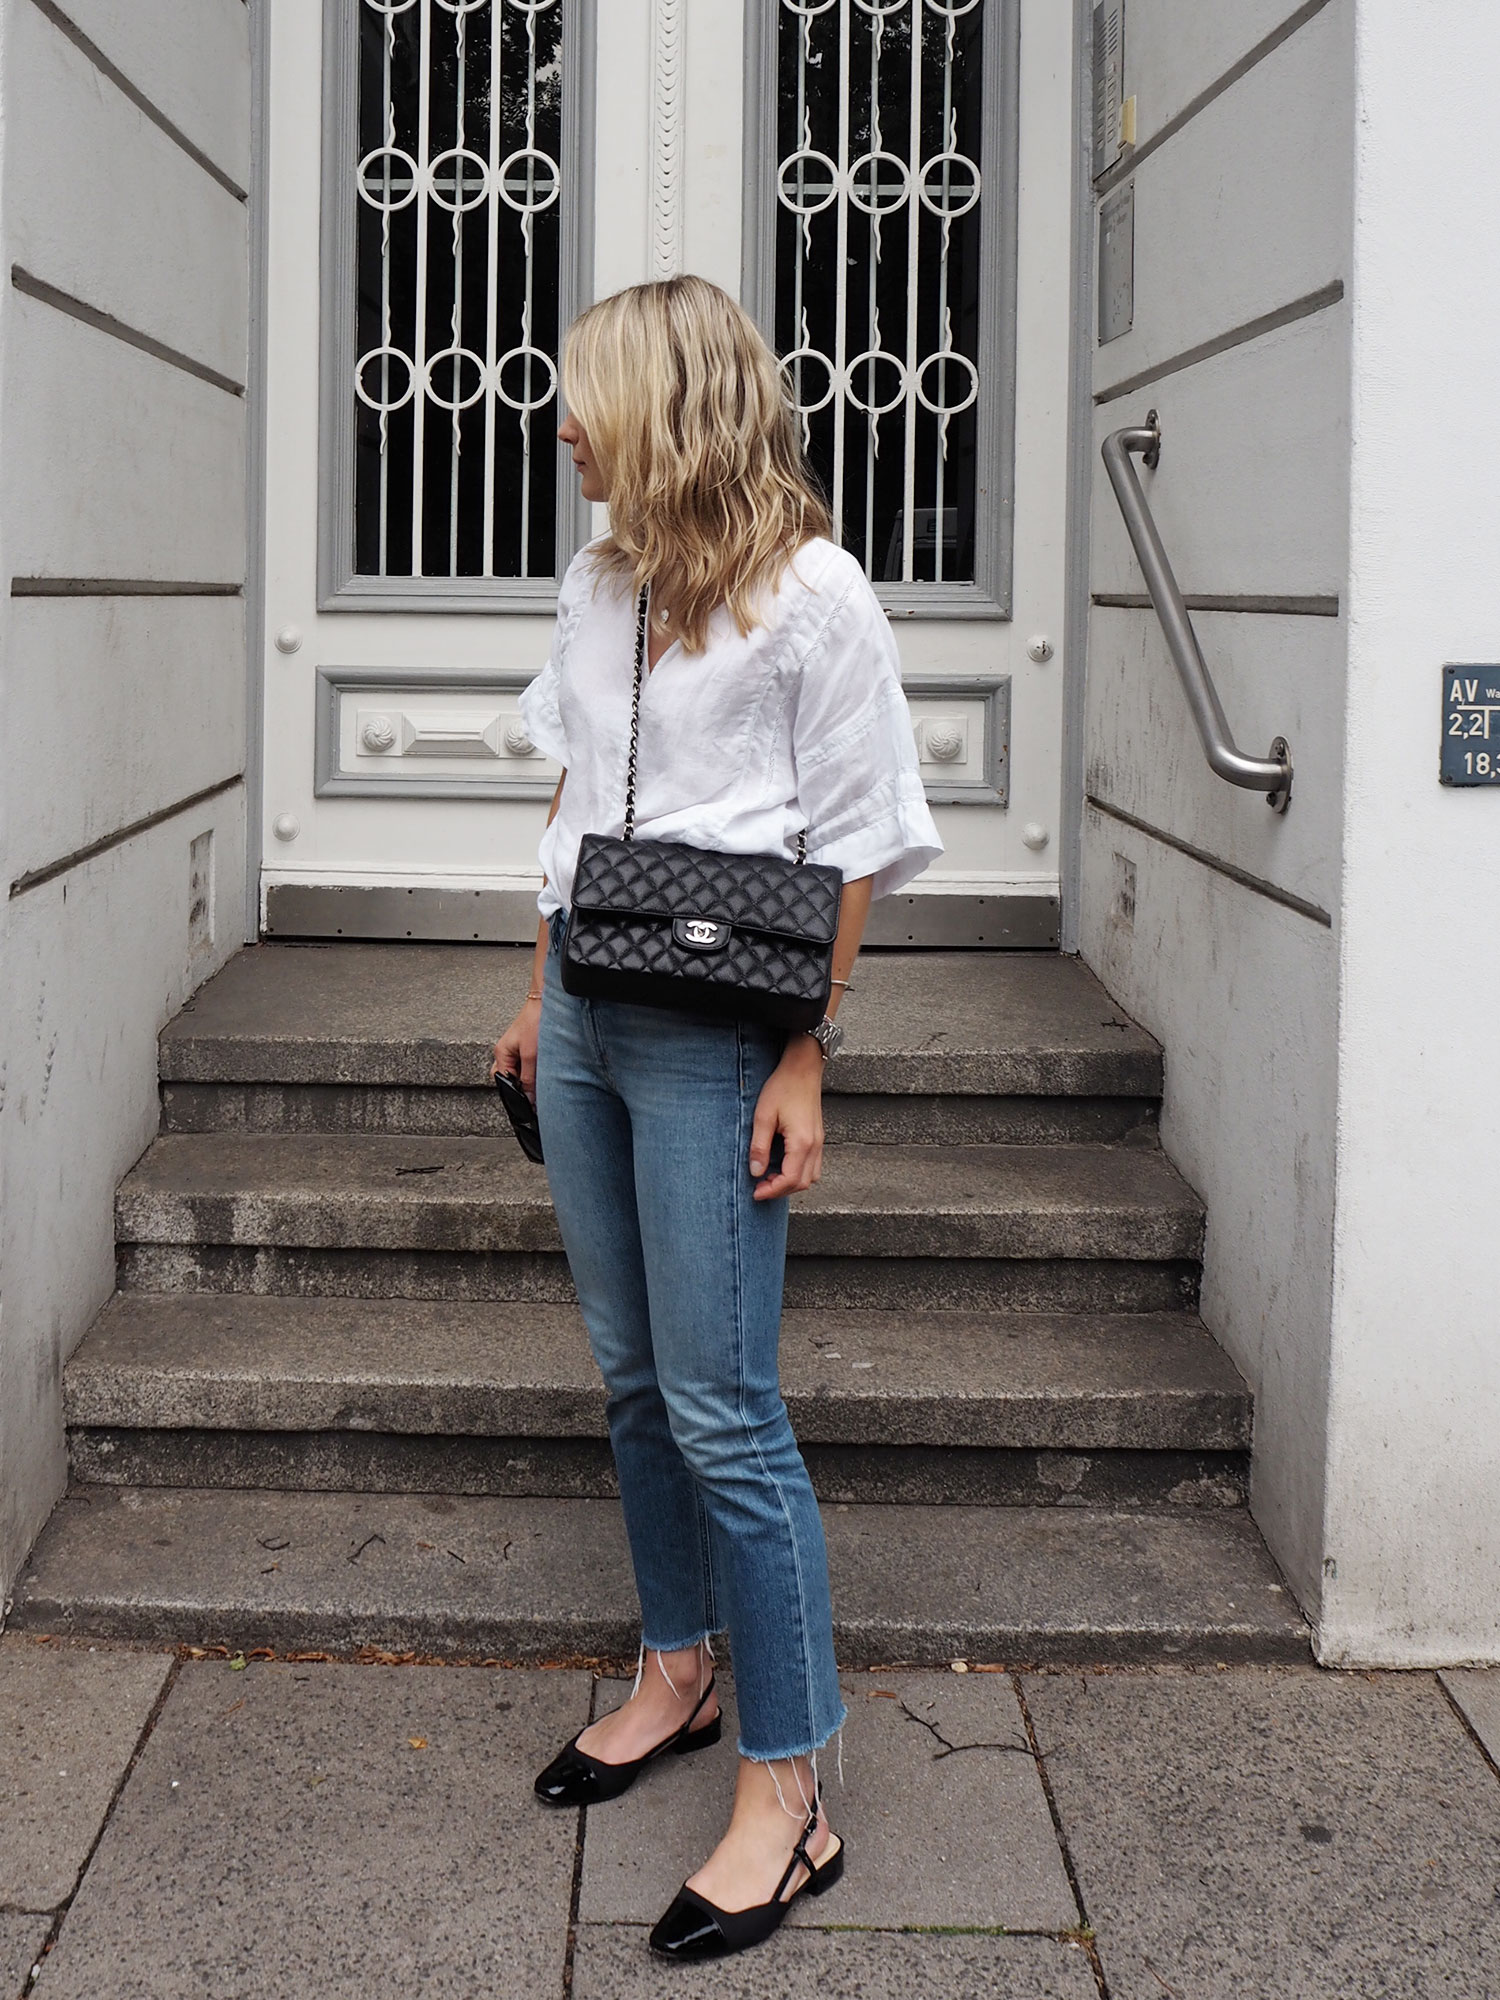 RosyCheeks-blog-small-Chanel-bag-4